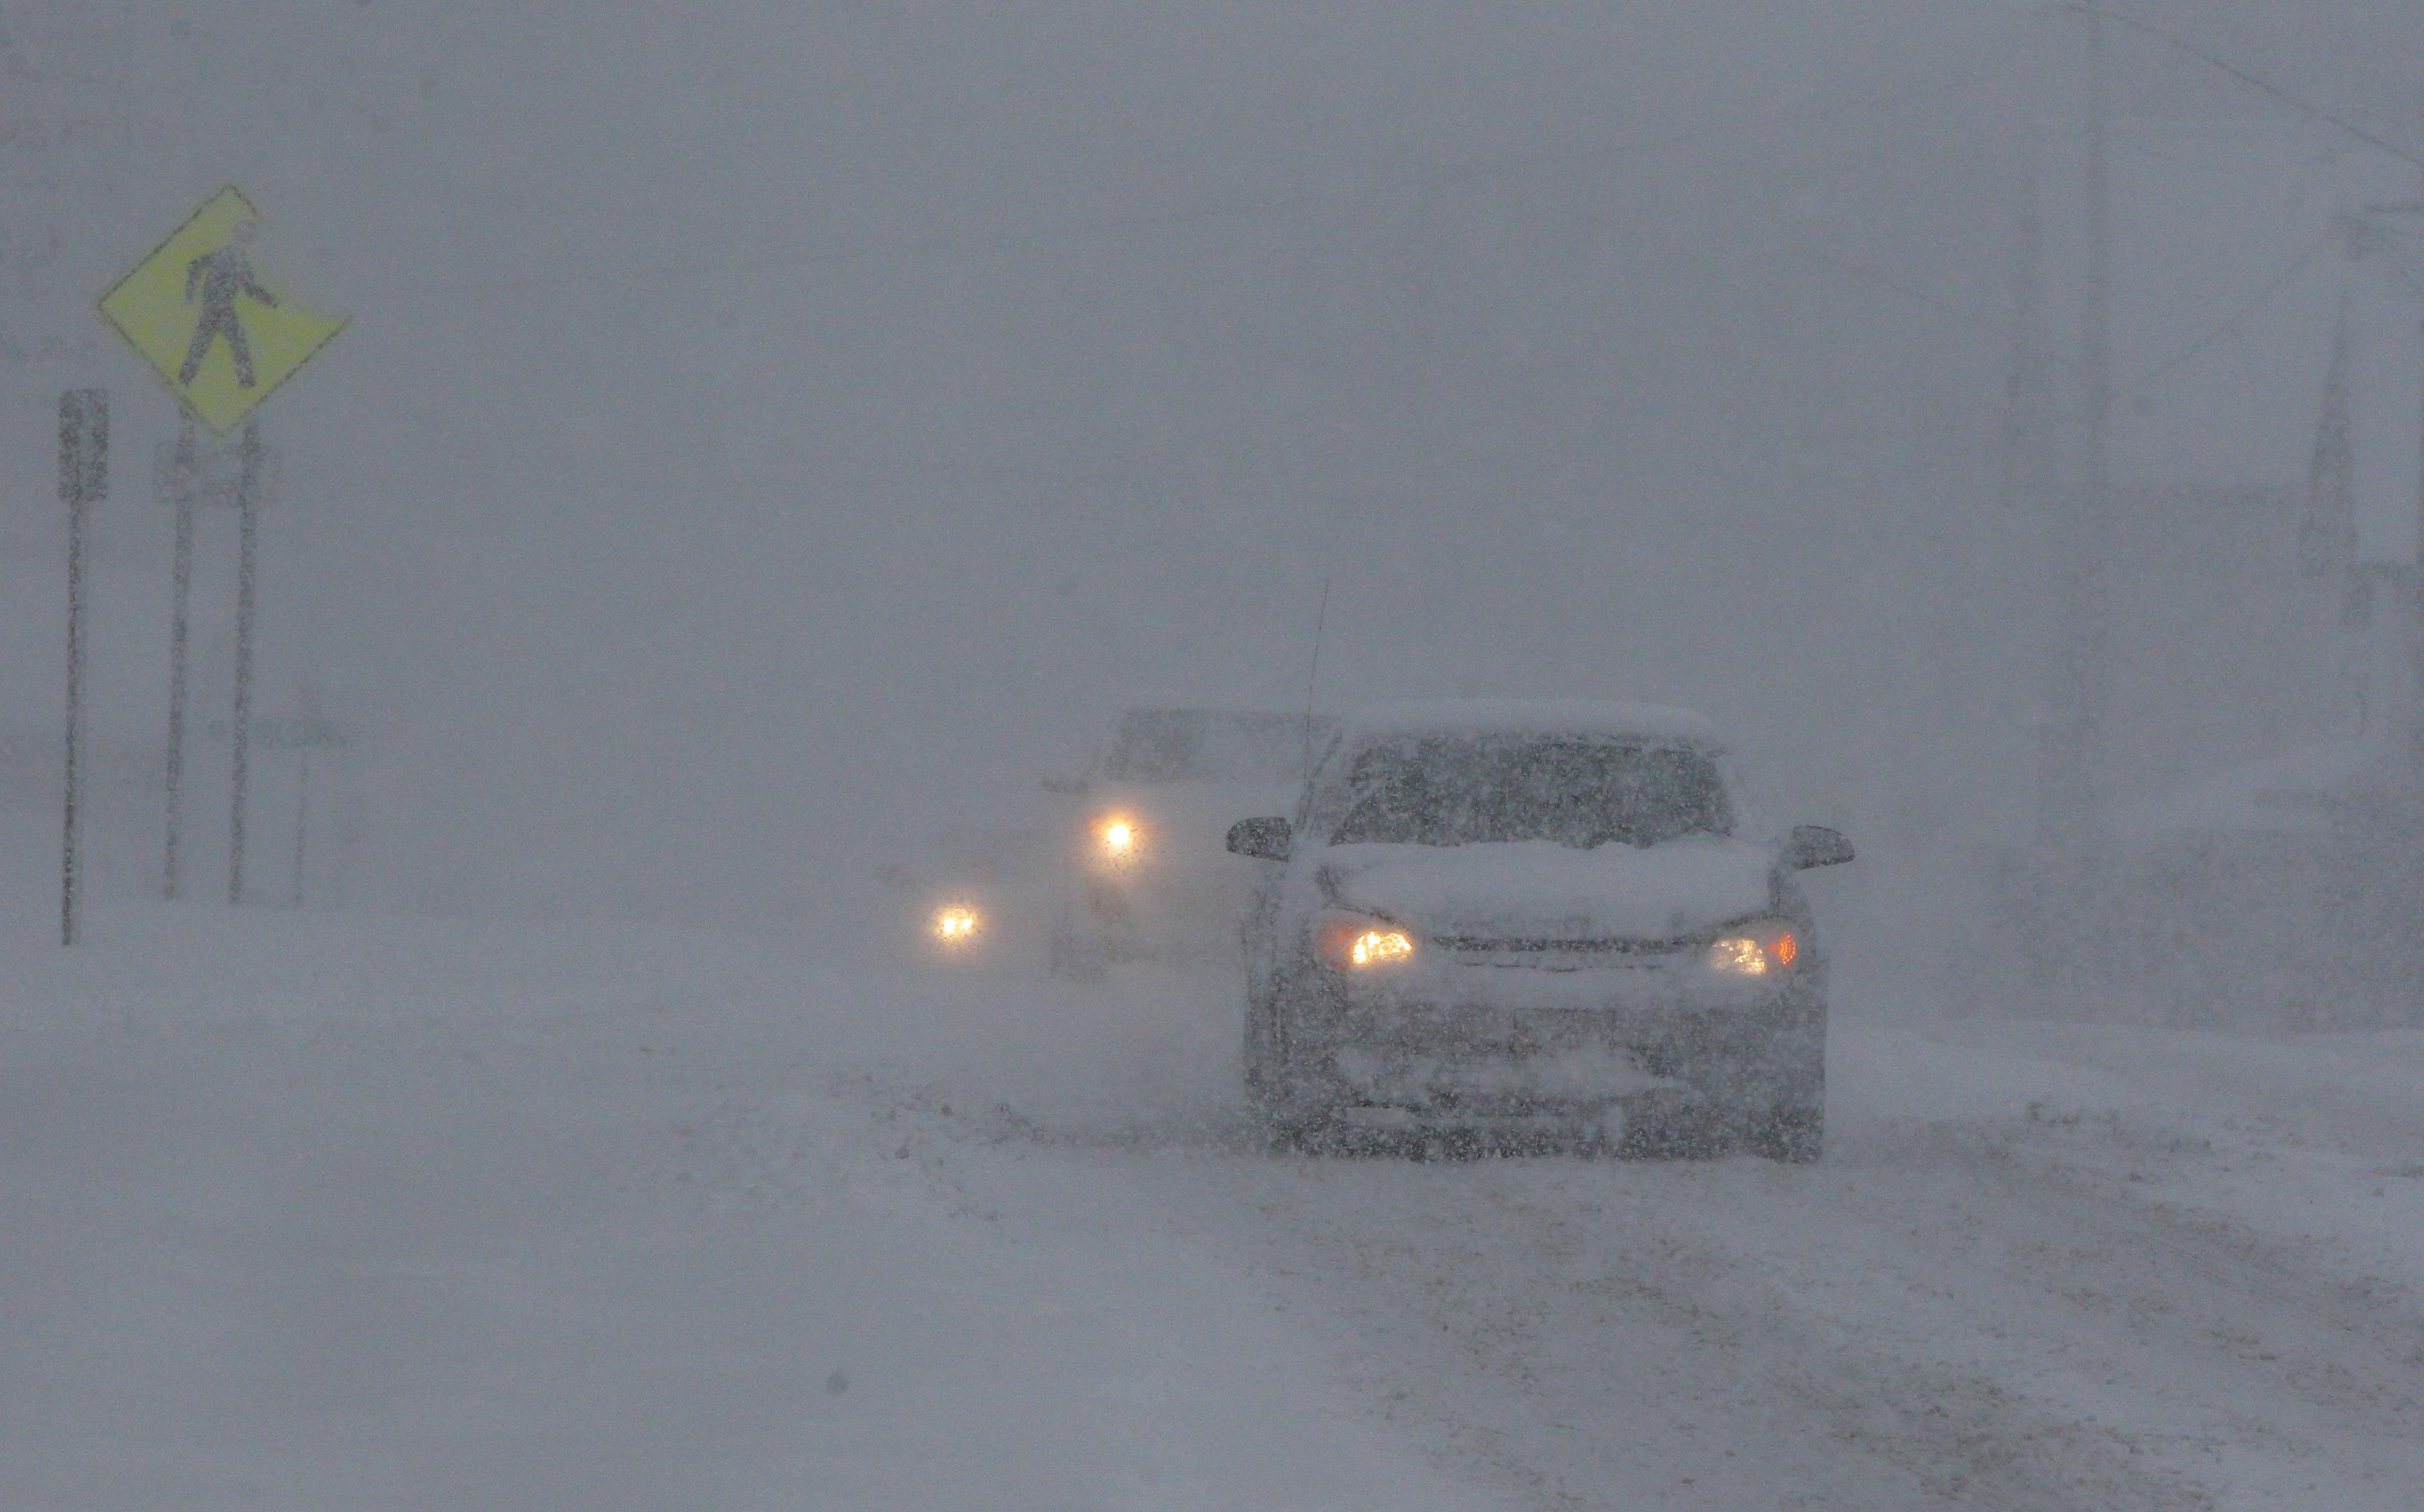 Falling snow makes the travel slow on Main Street in Springville on Thursday, December 8, 2016.    (Mark Mulville/The Buffalo News)